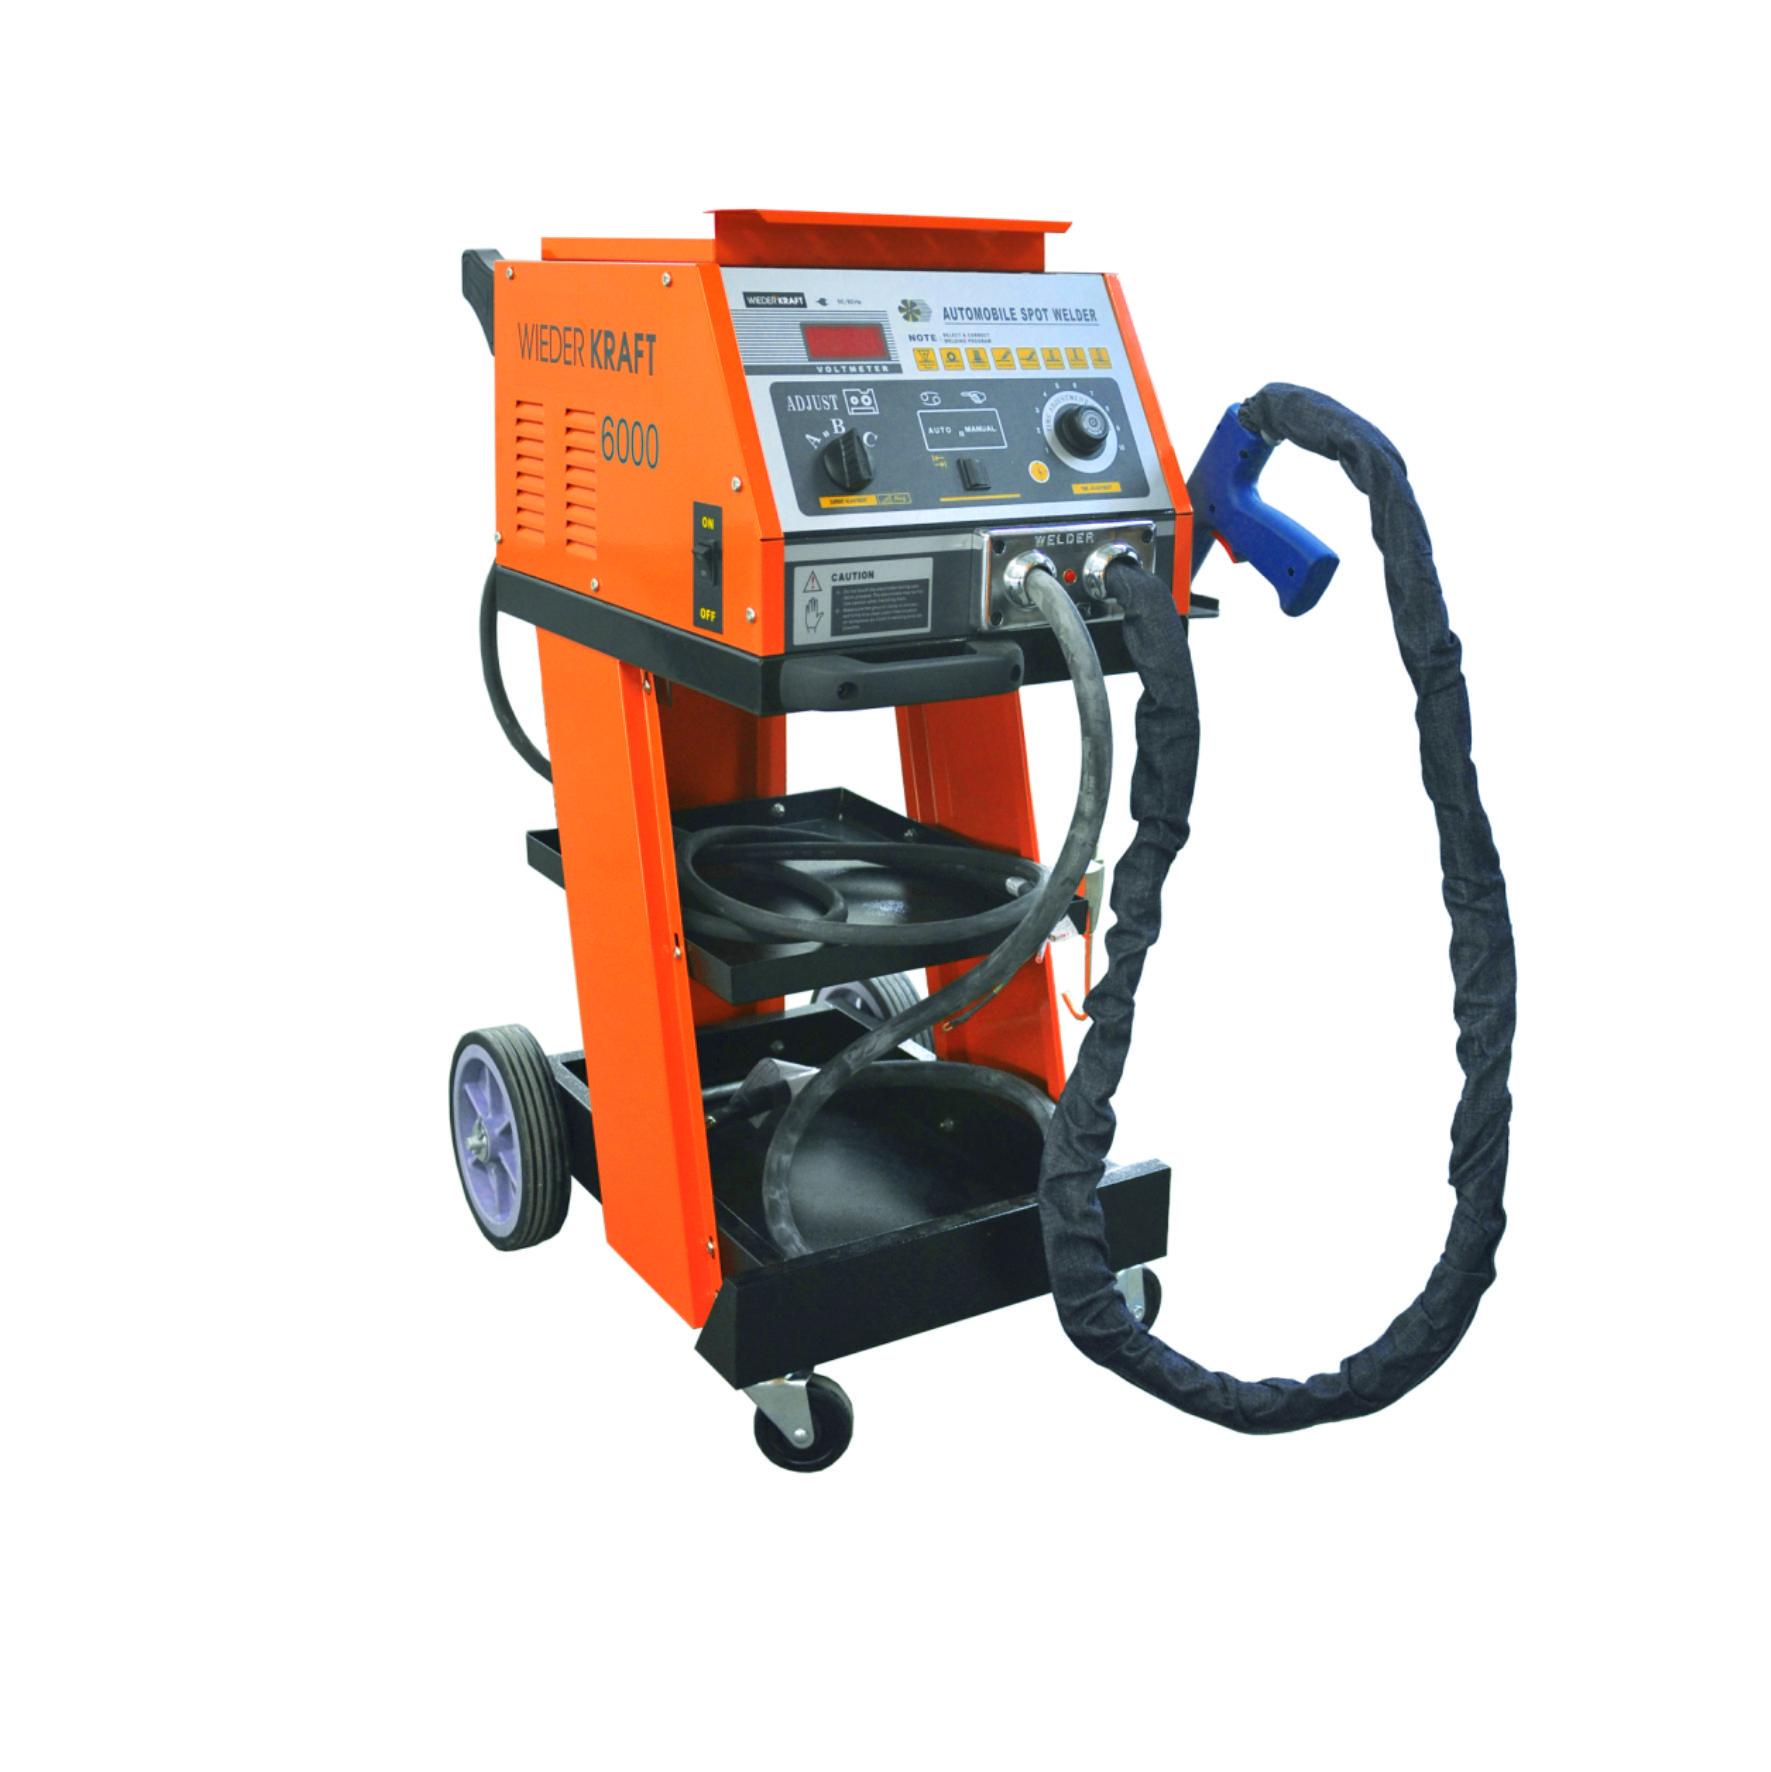 Сварочный аппарат Wiederkraft Wdk-6000